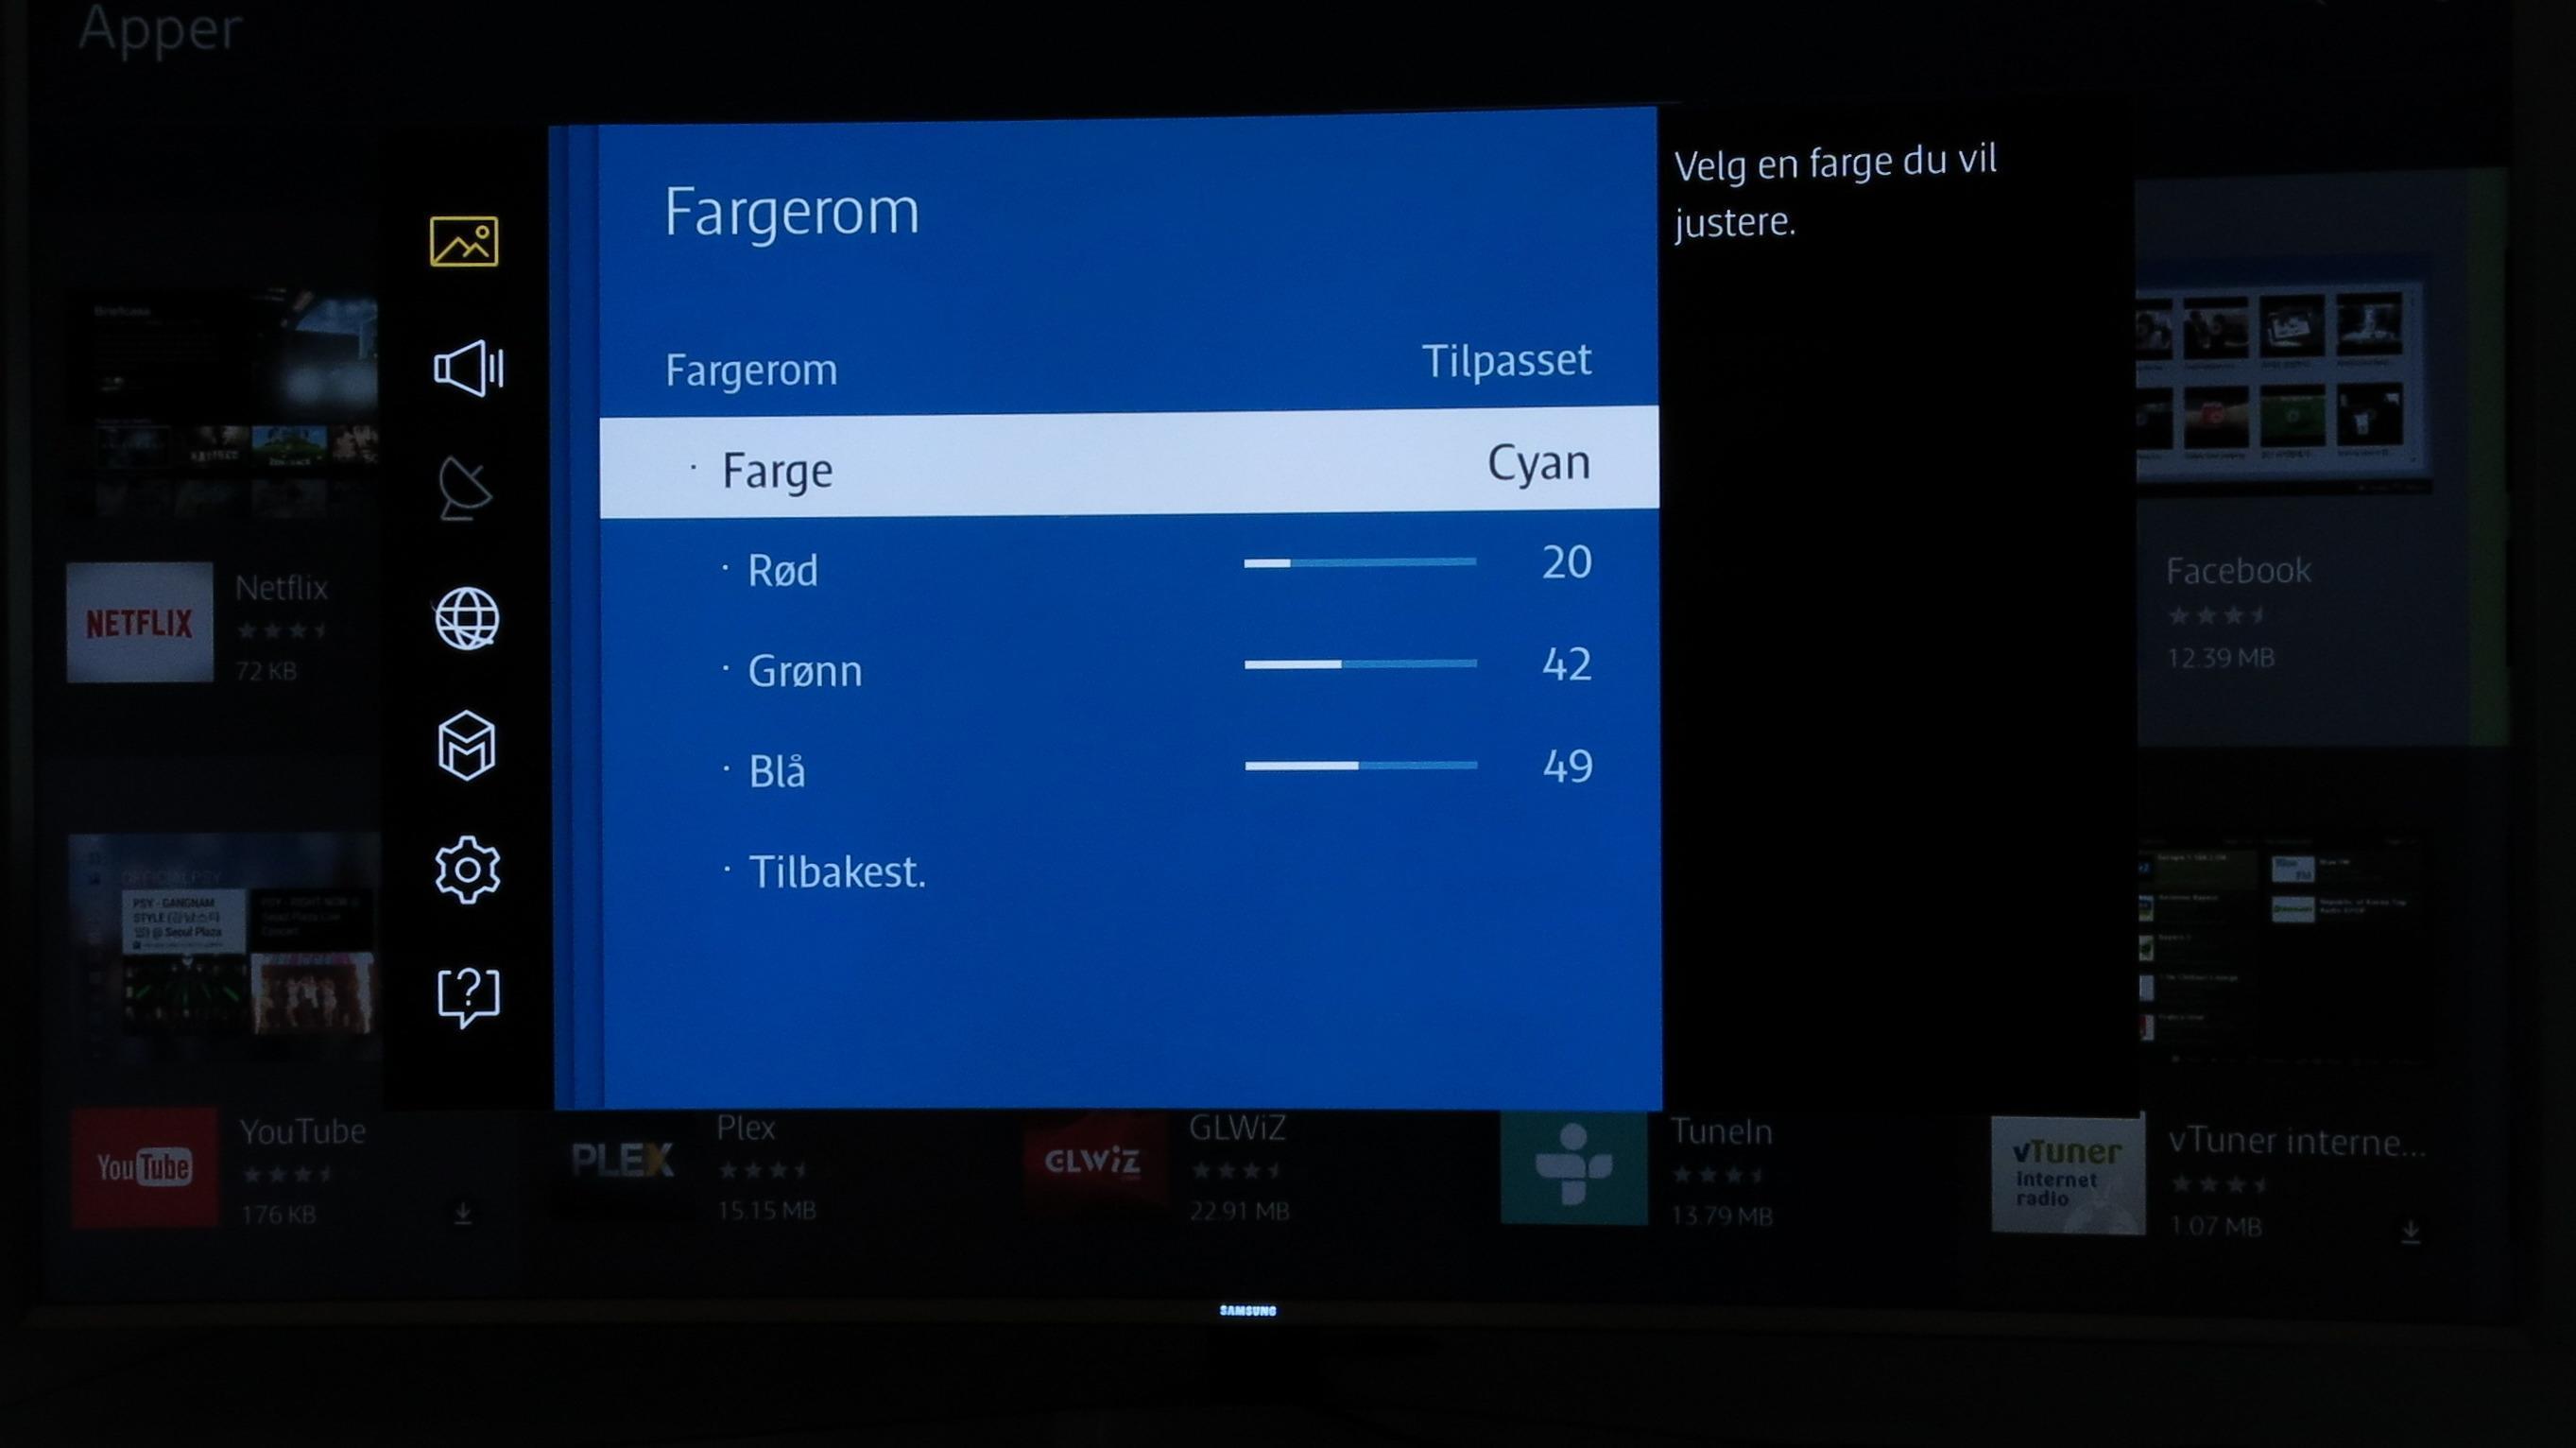 Farger: Cyan